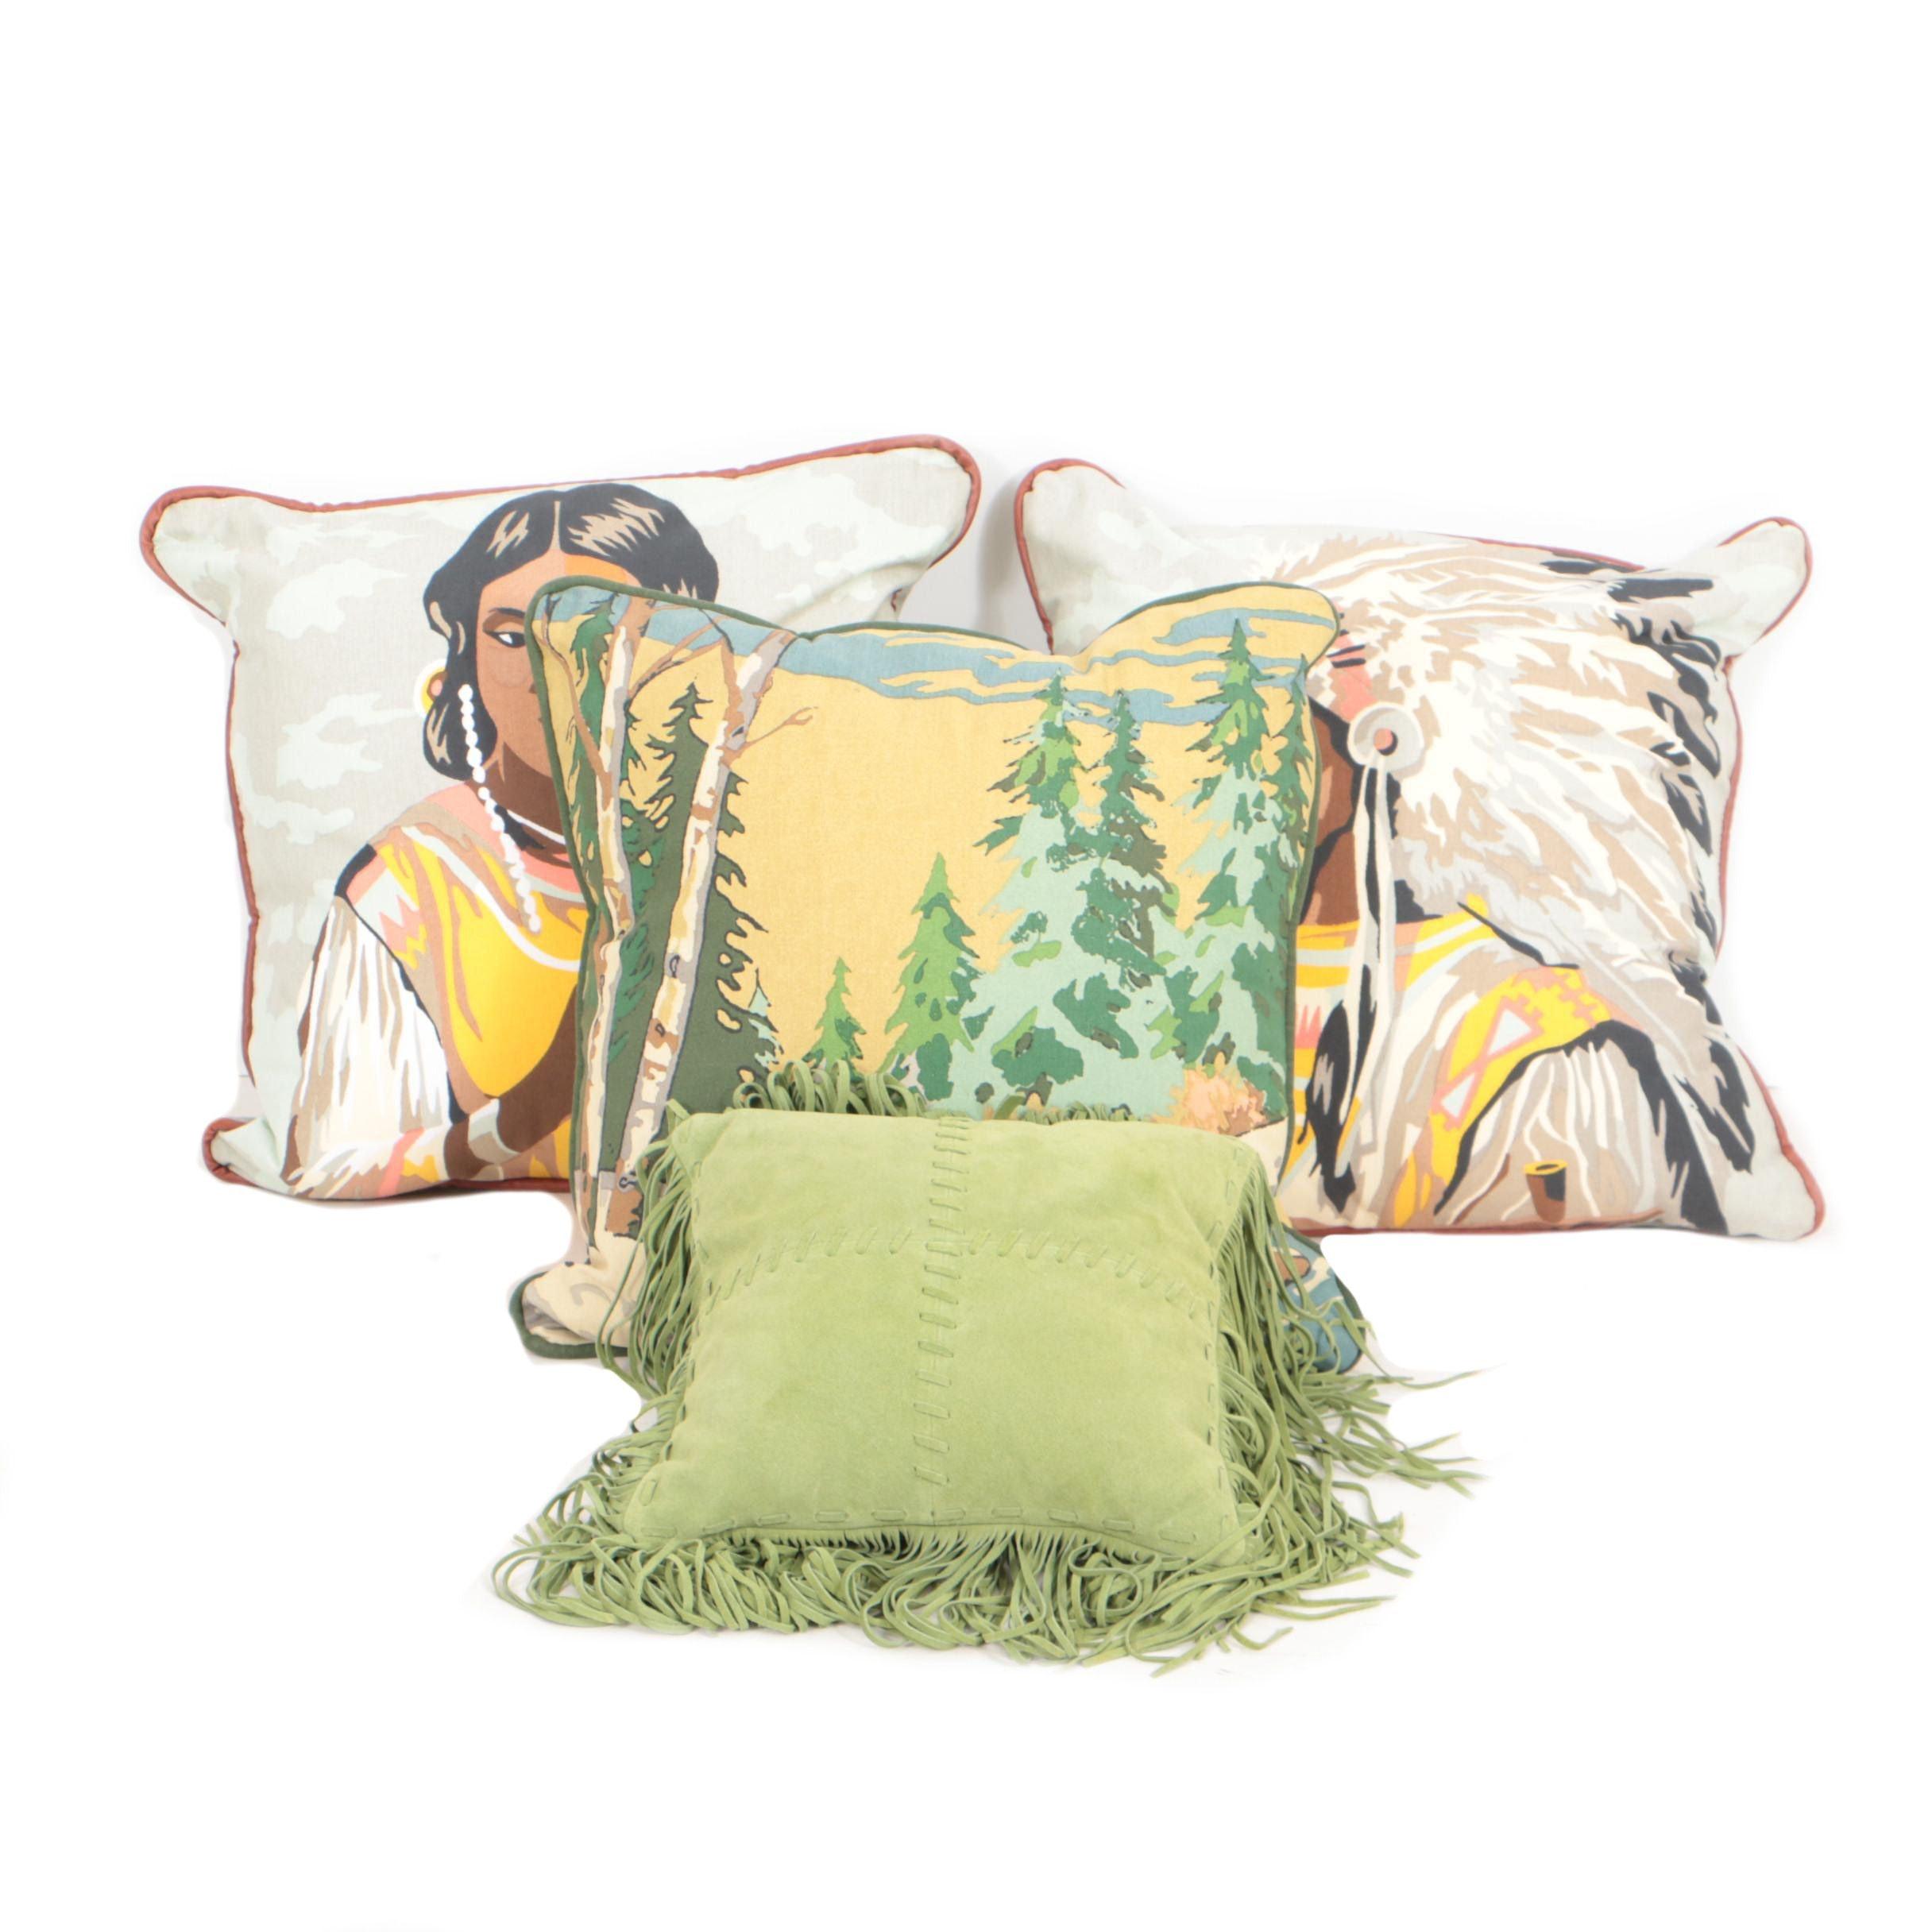 Chandler 4 Corners and Tasha Polizzi Throw Pillows